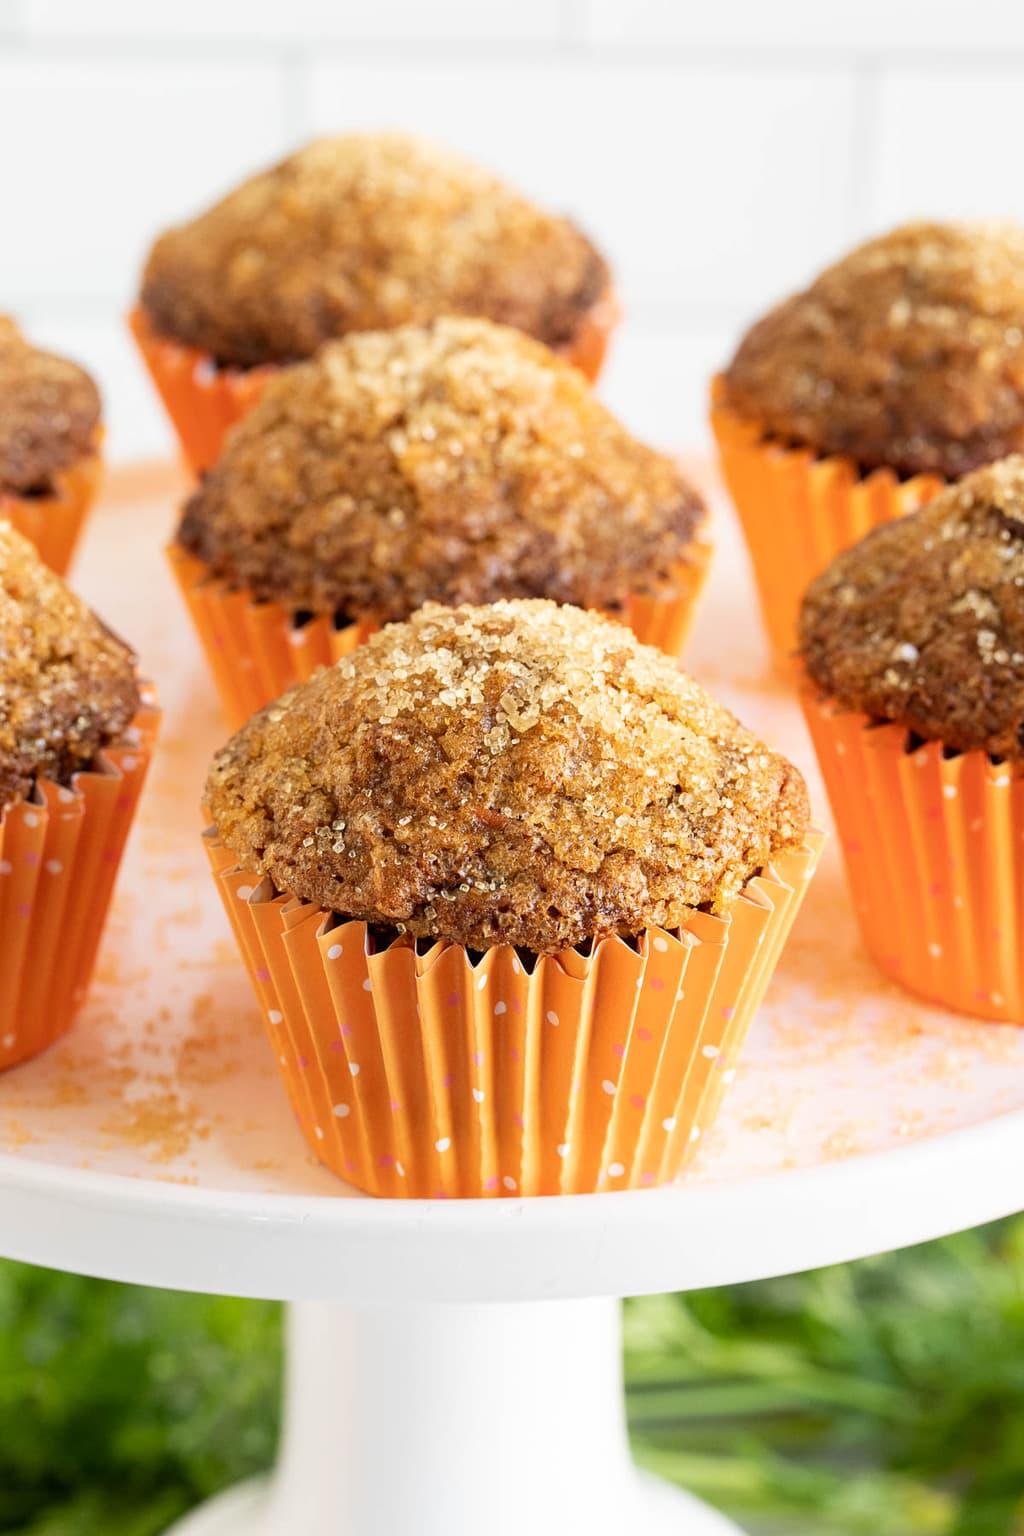 Vertical closeup photo of Sugar Top Carrot Muffins in orange cupcake liners on a white pedestal cake platter.